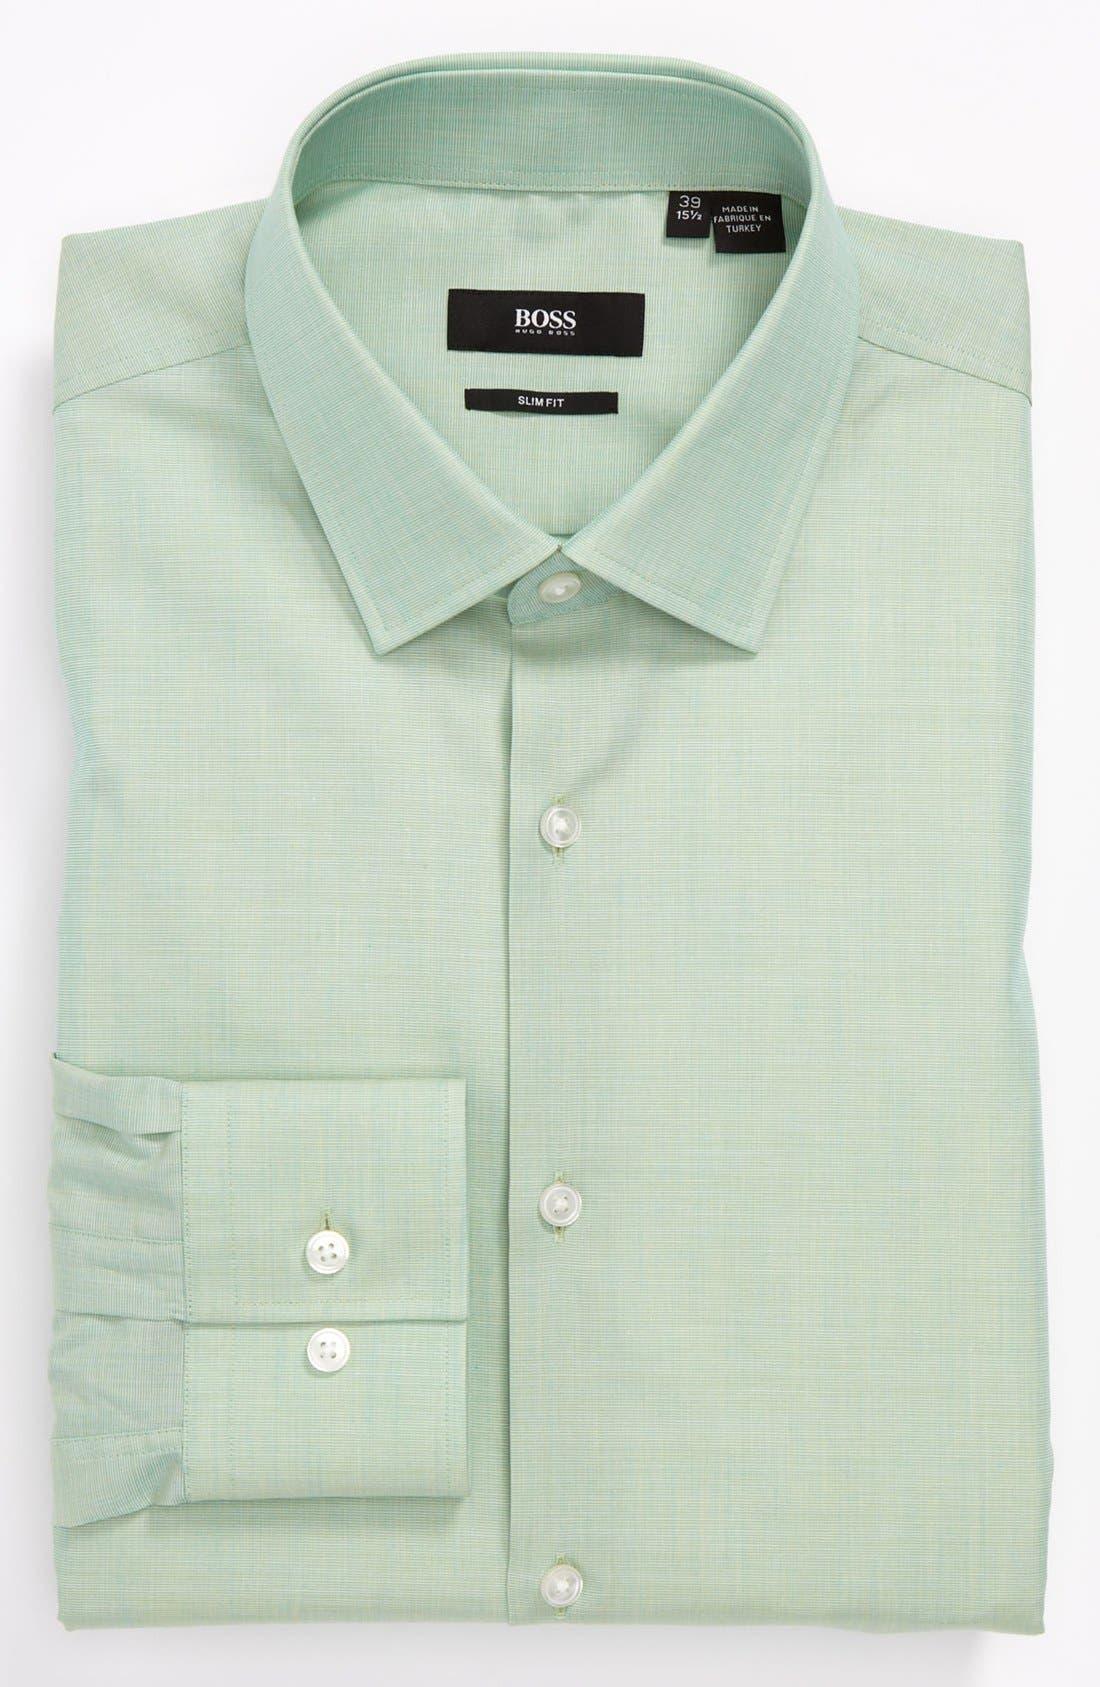 HUGO BOSS Slim Fit Dress Shirt,                             Main thumbnail 1, color,                             363